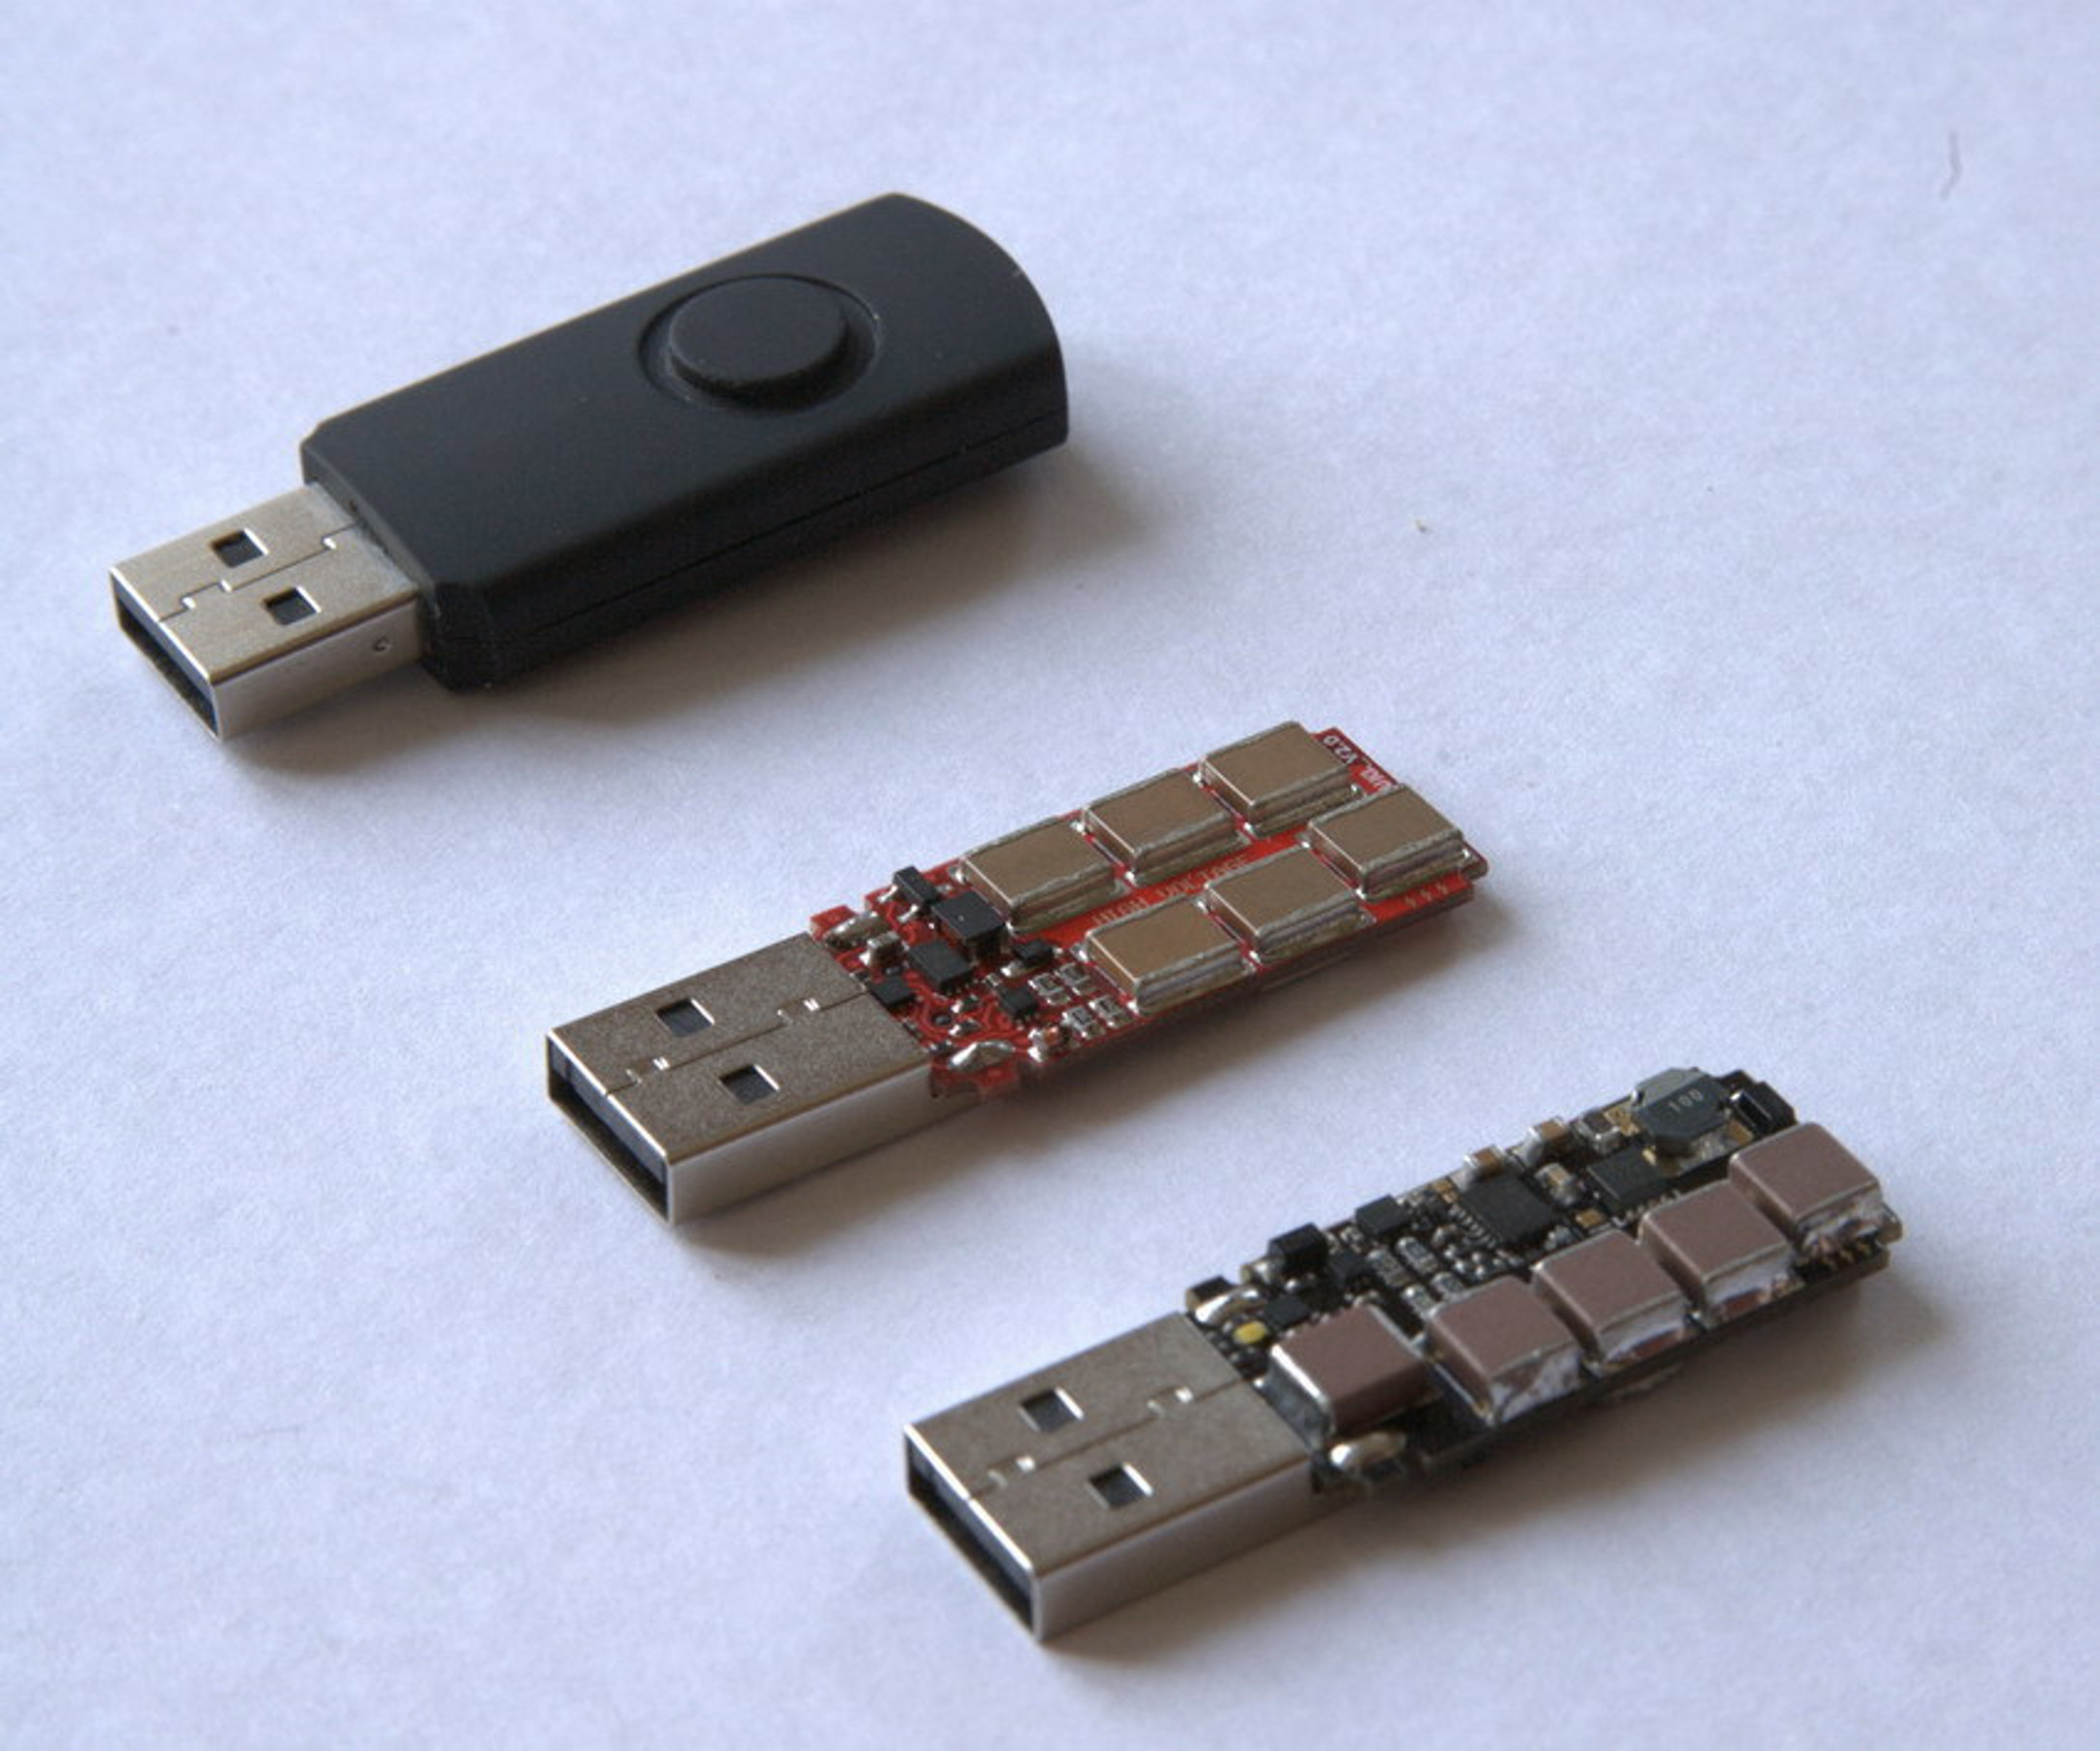 http://www.diazmag.com/wp-content/uploads/2015/10/USB-Killer-2.0.jpg